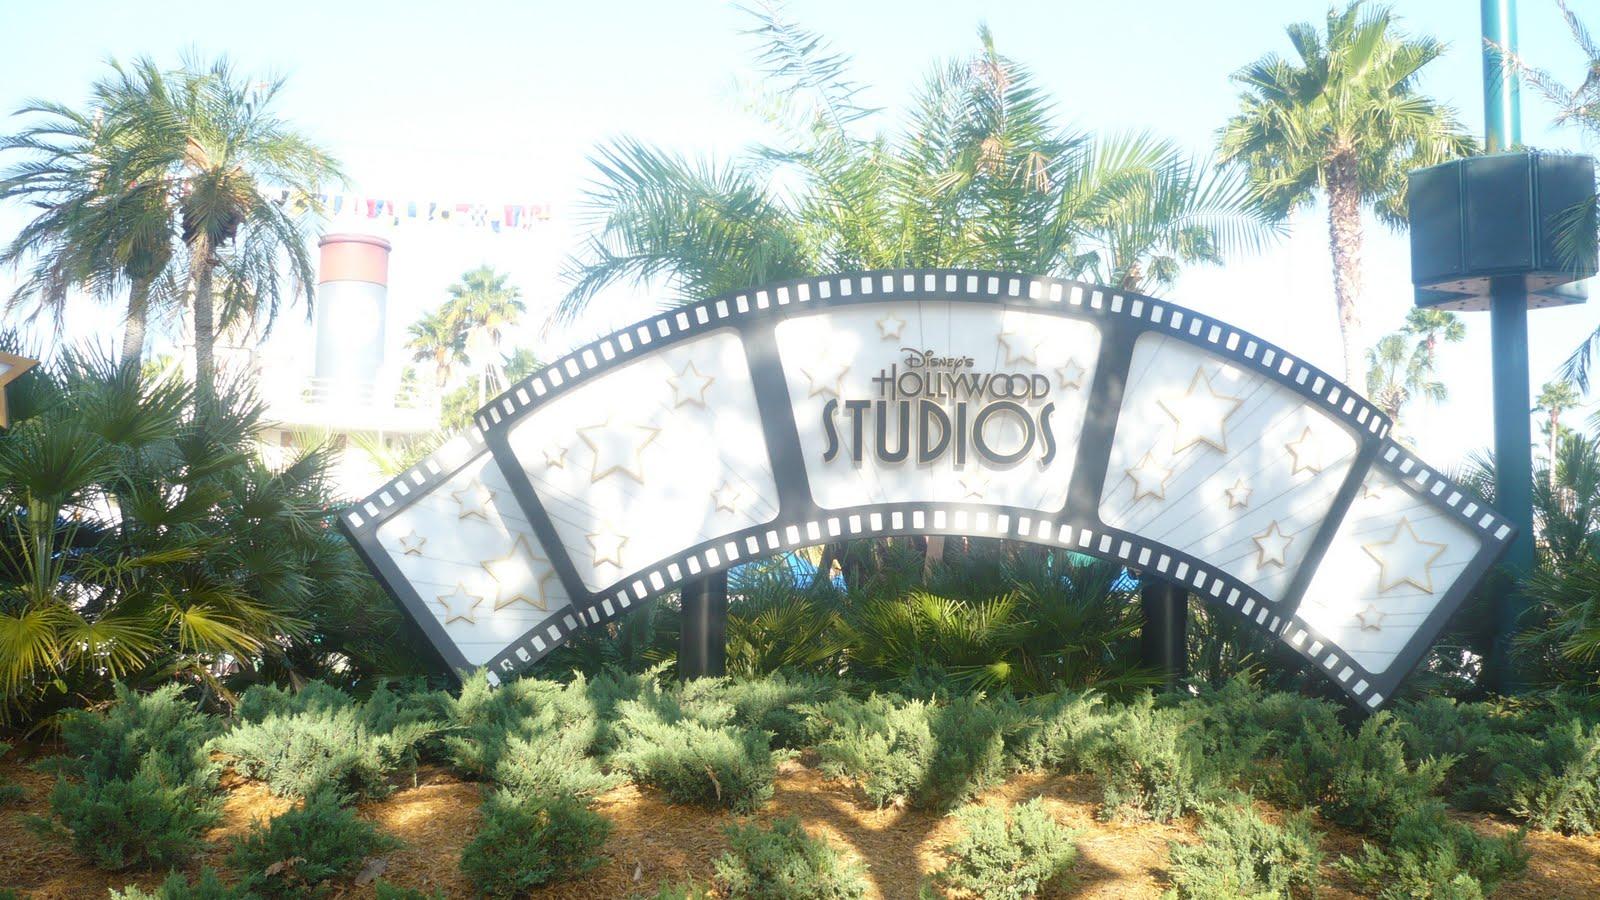 Lot 9 Disney 5 MINUTE STORY Books NEW Stories BOOK MIckey NEMO Cars TOY Simba